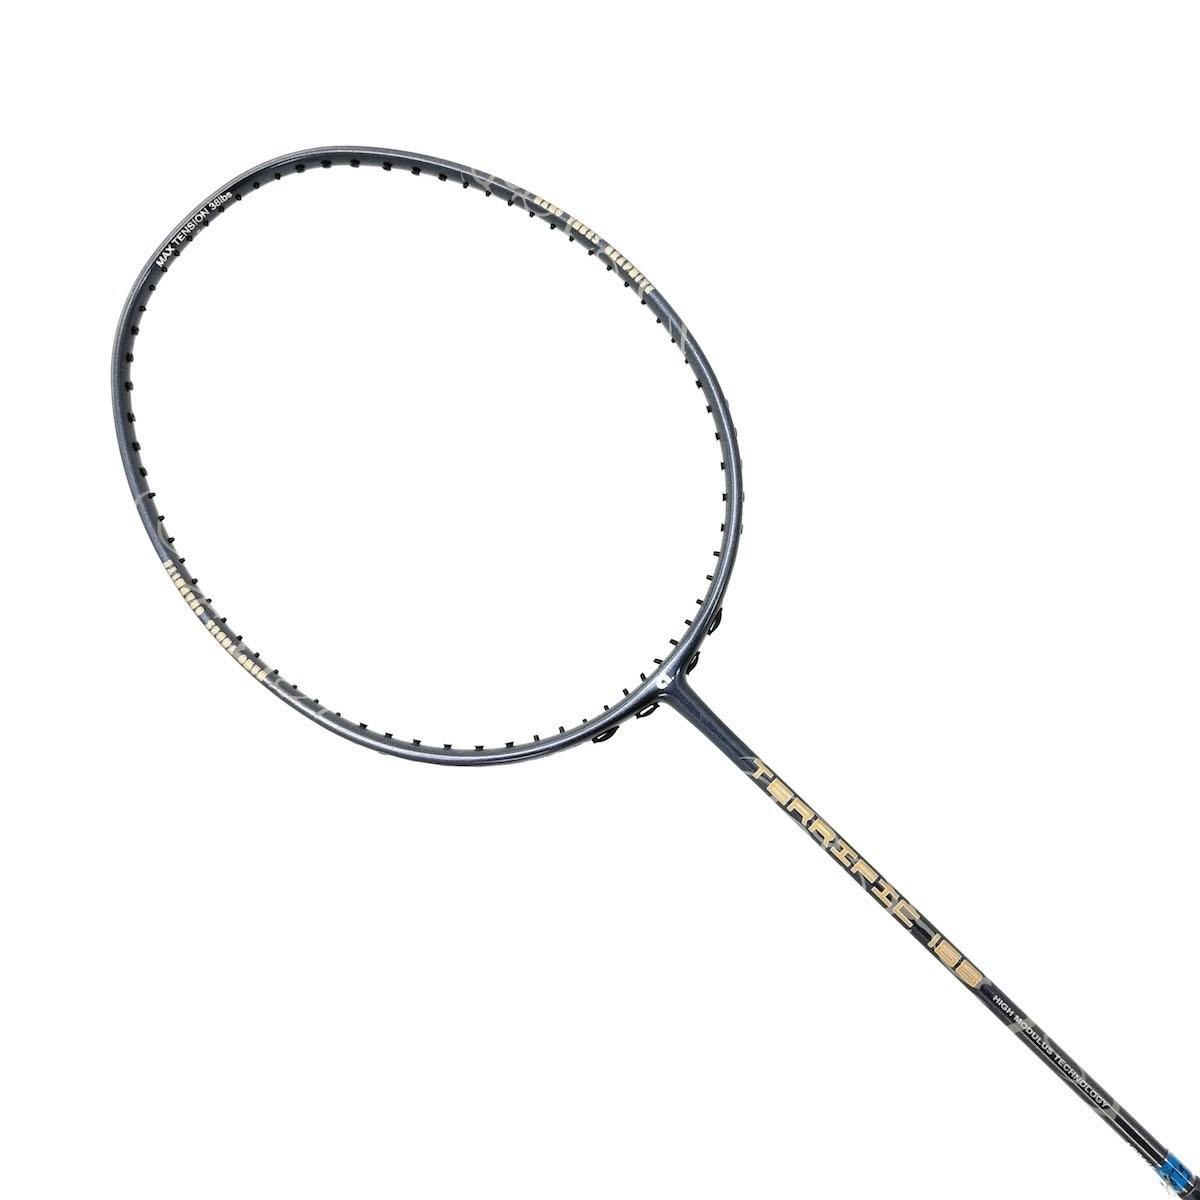 Apacs Terrific 168 Grey Badminton Racquet